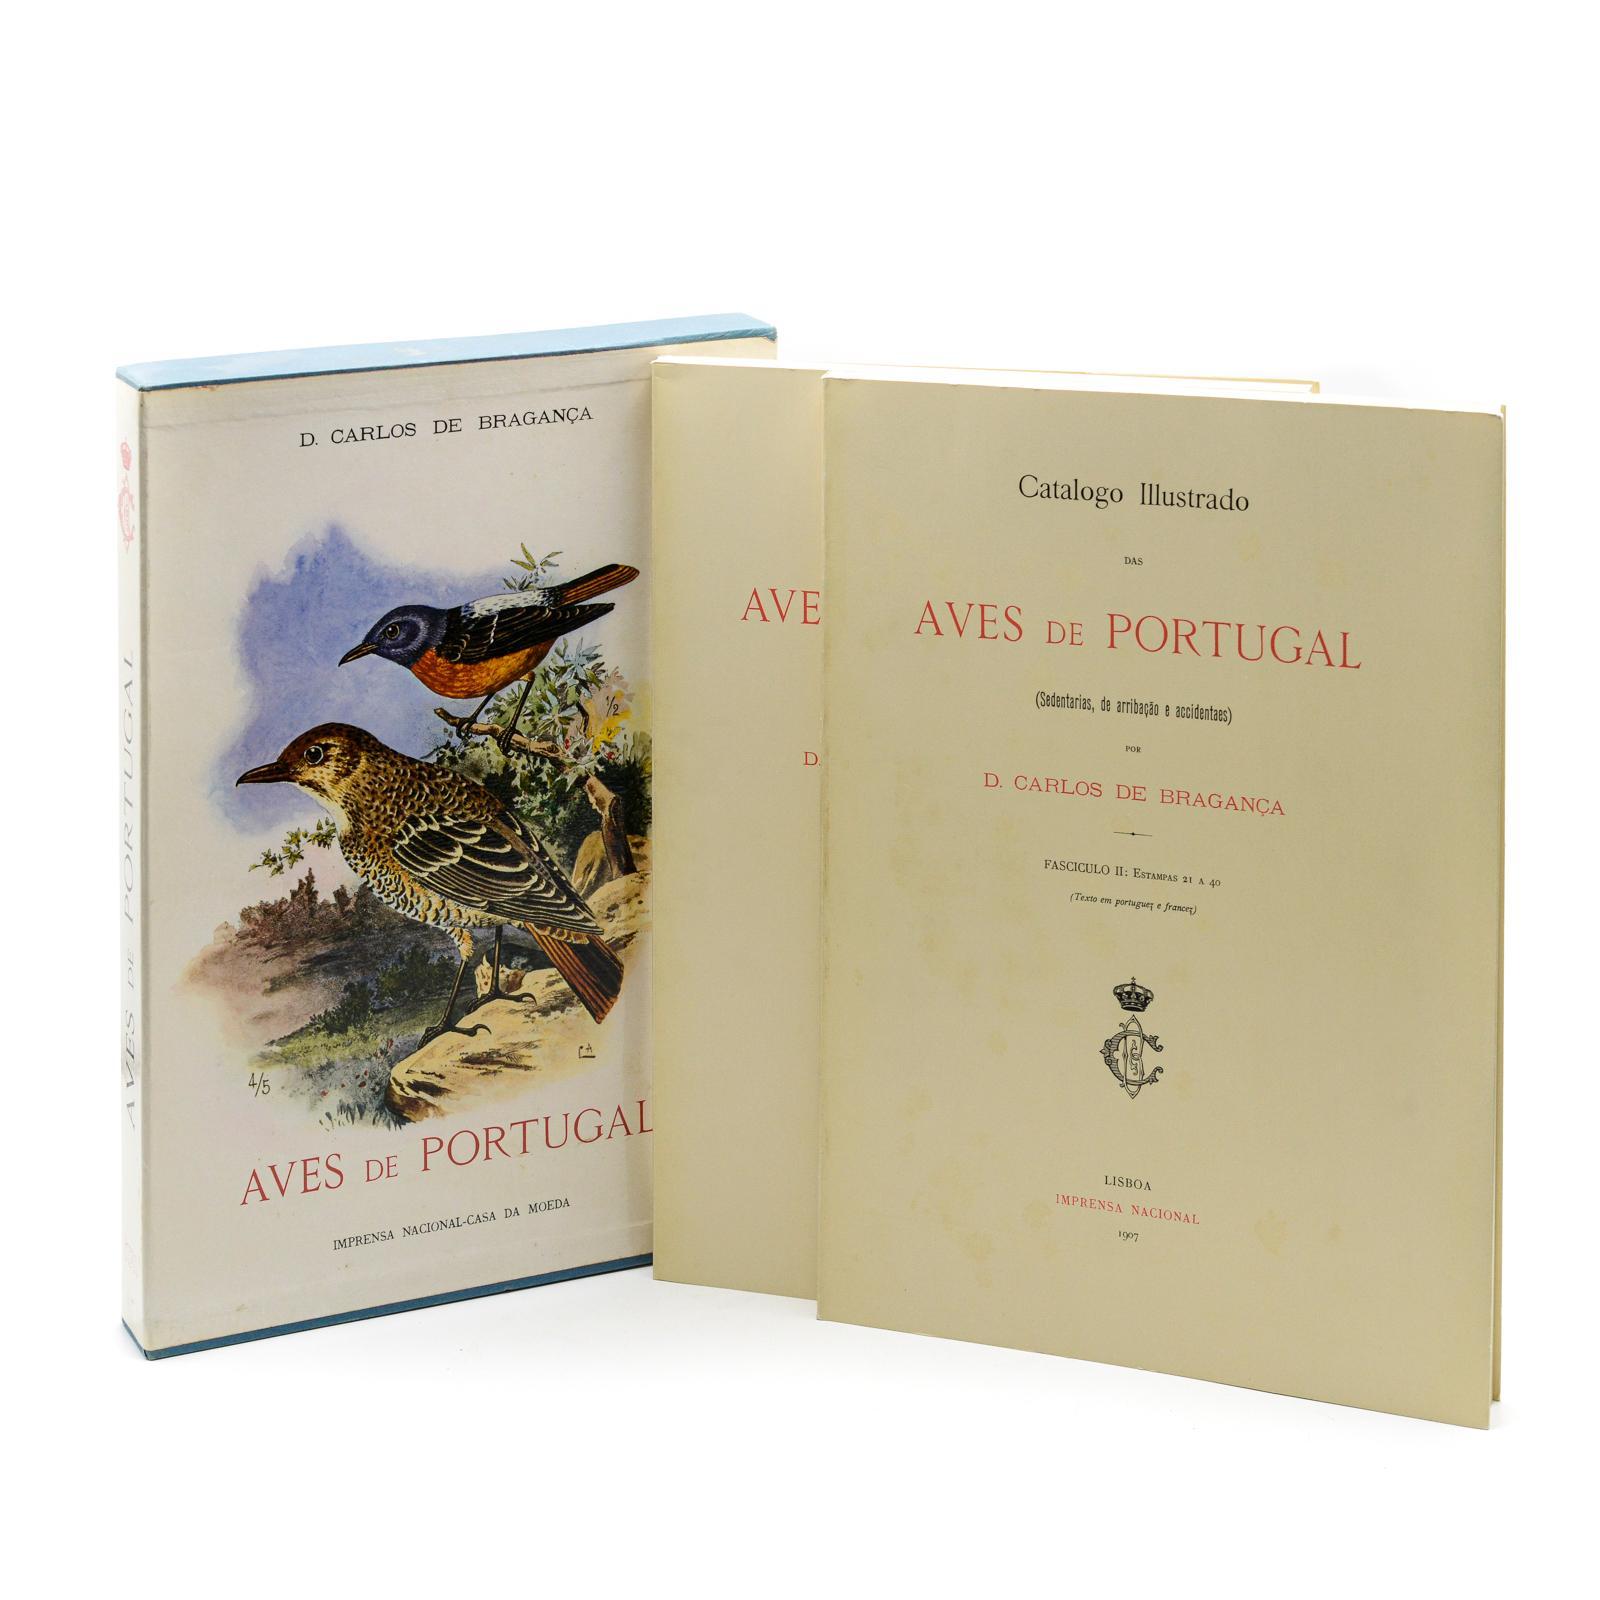 CATALOGO ILLUSTRADO DAS AVES DE PORTUGAL, 2 vols.